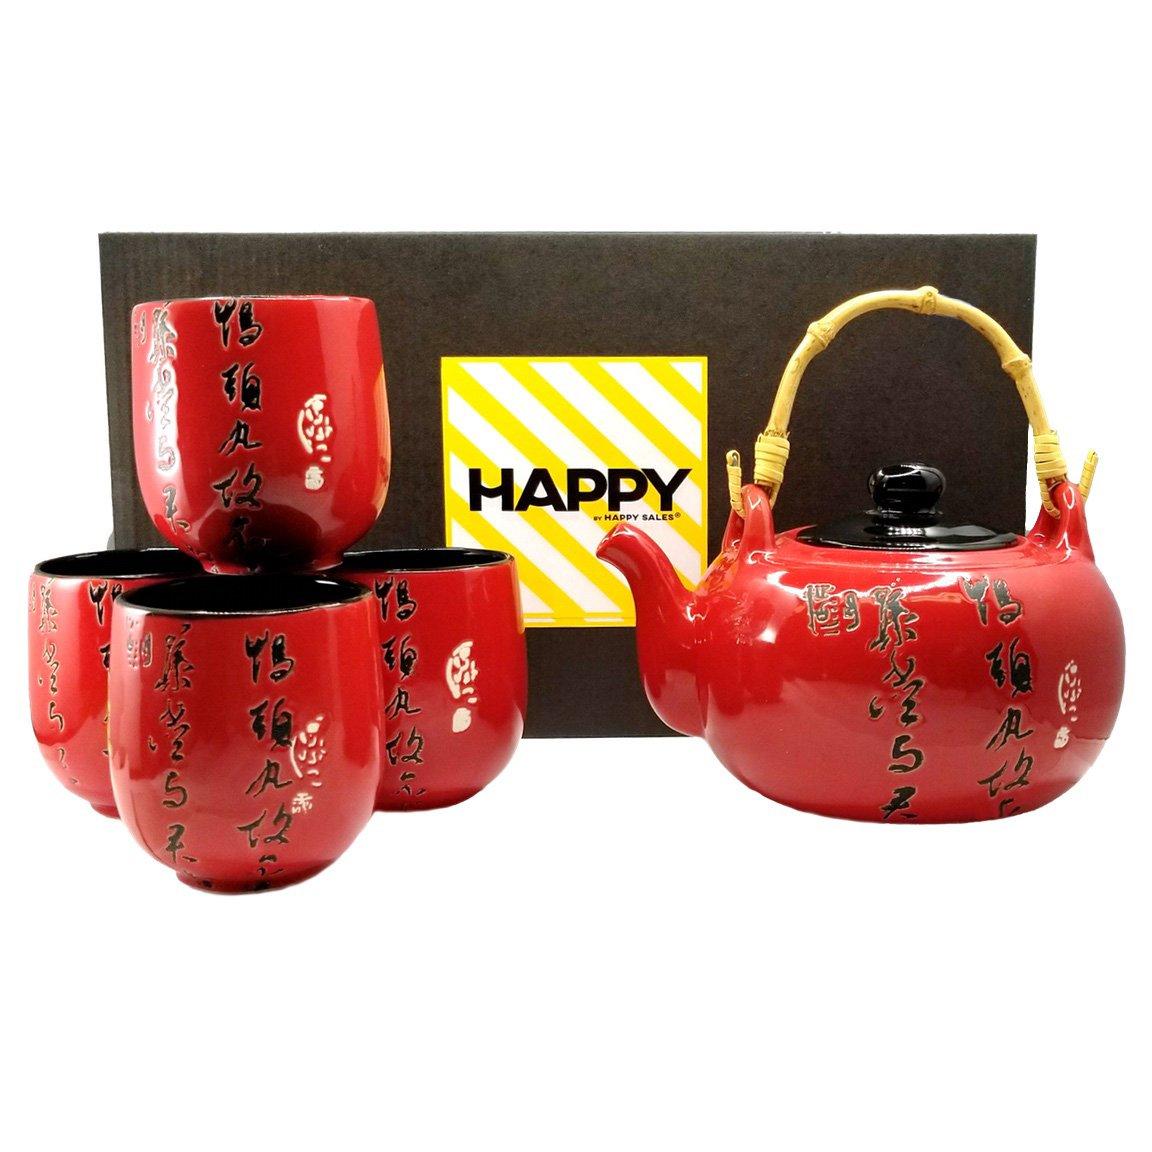 Japanese 6 Pc Rice Soup Bowl Set Red Kanji Happy Sales HSX6401/A